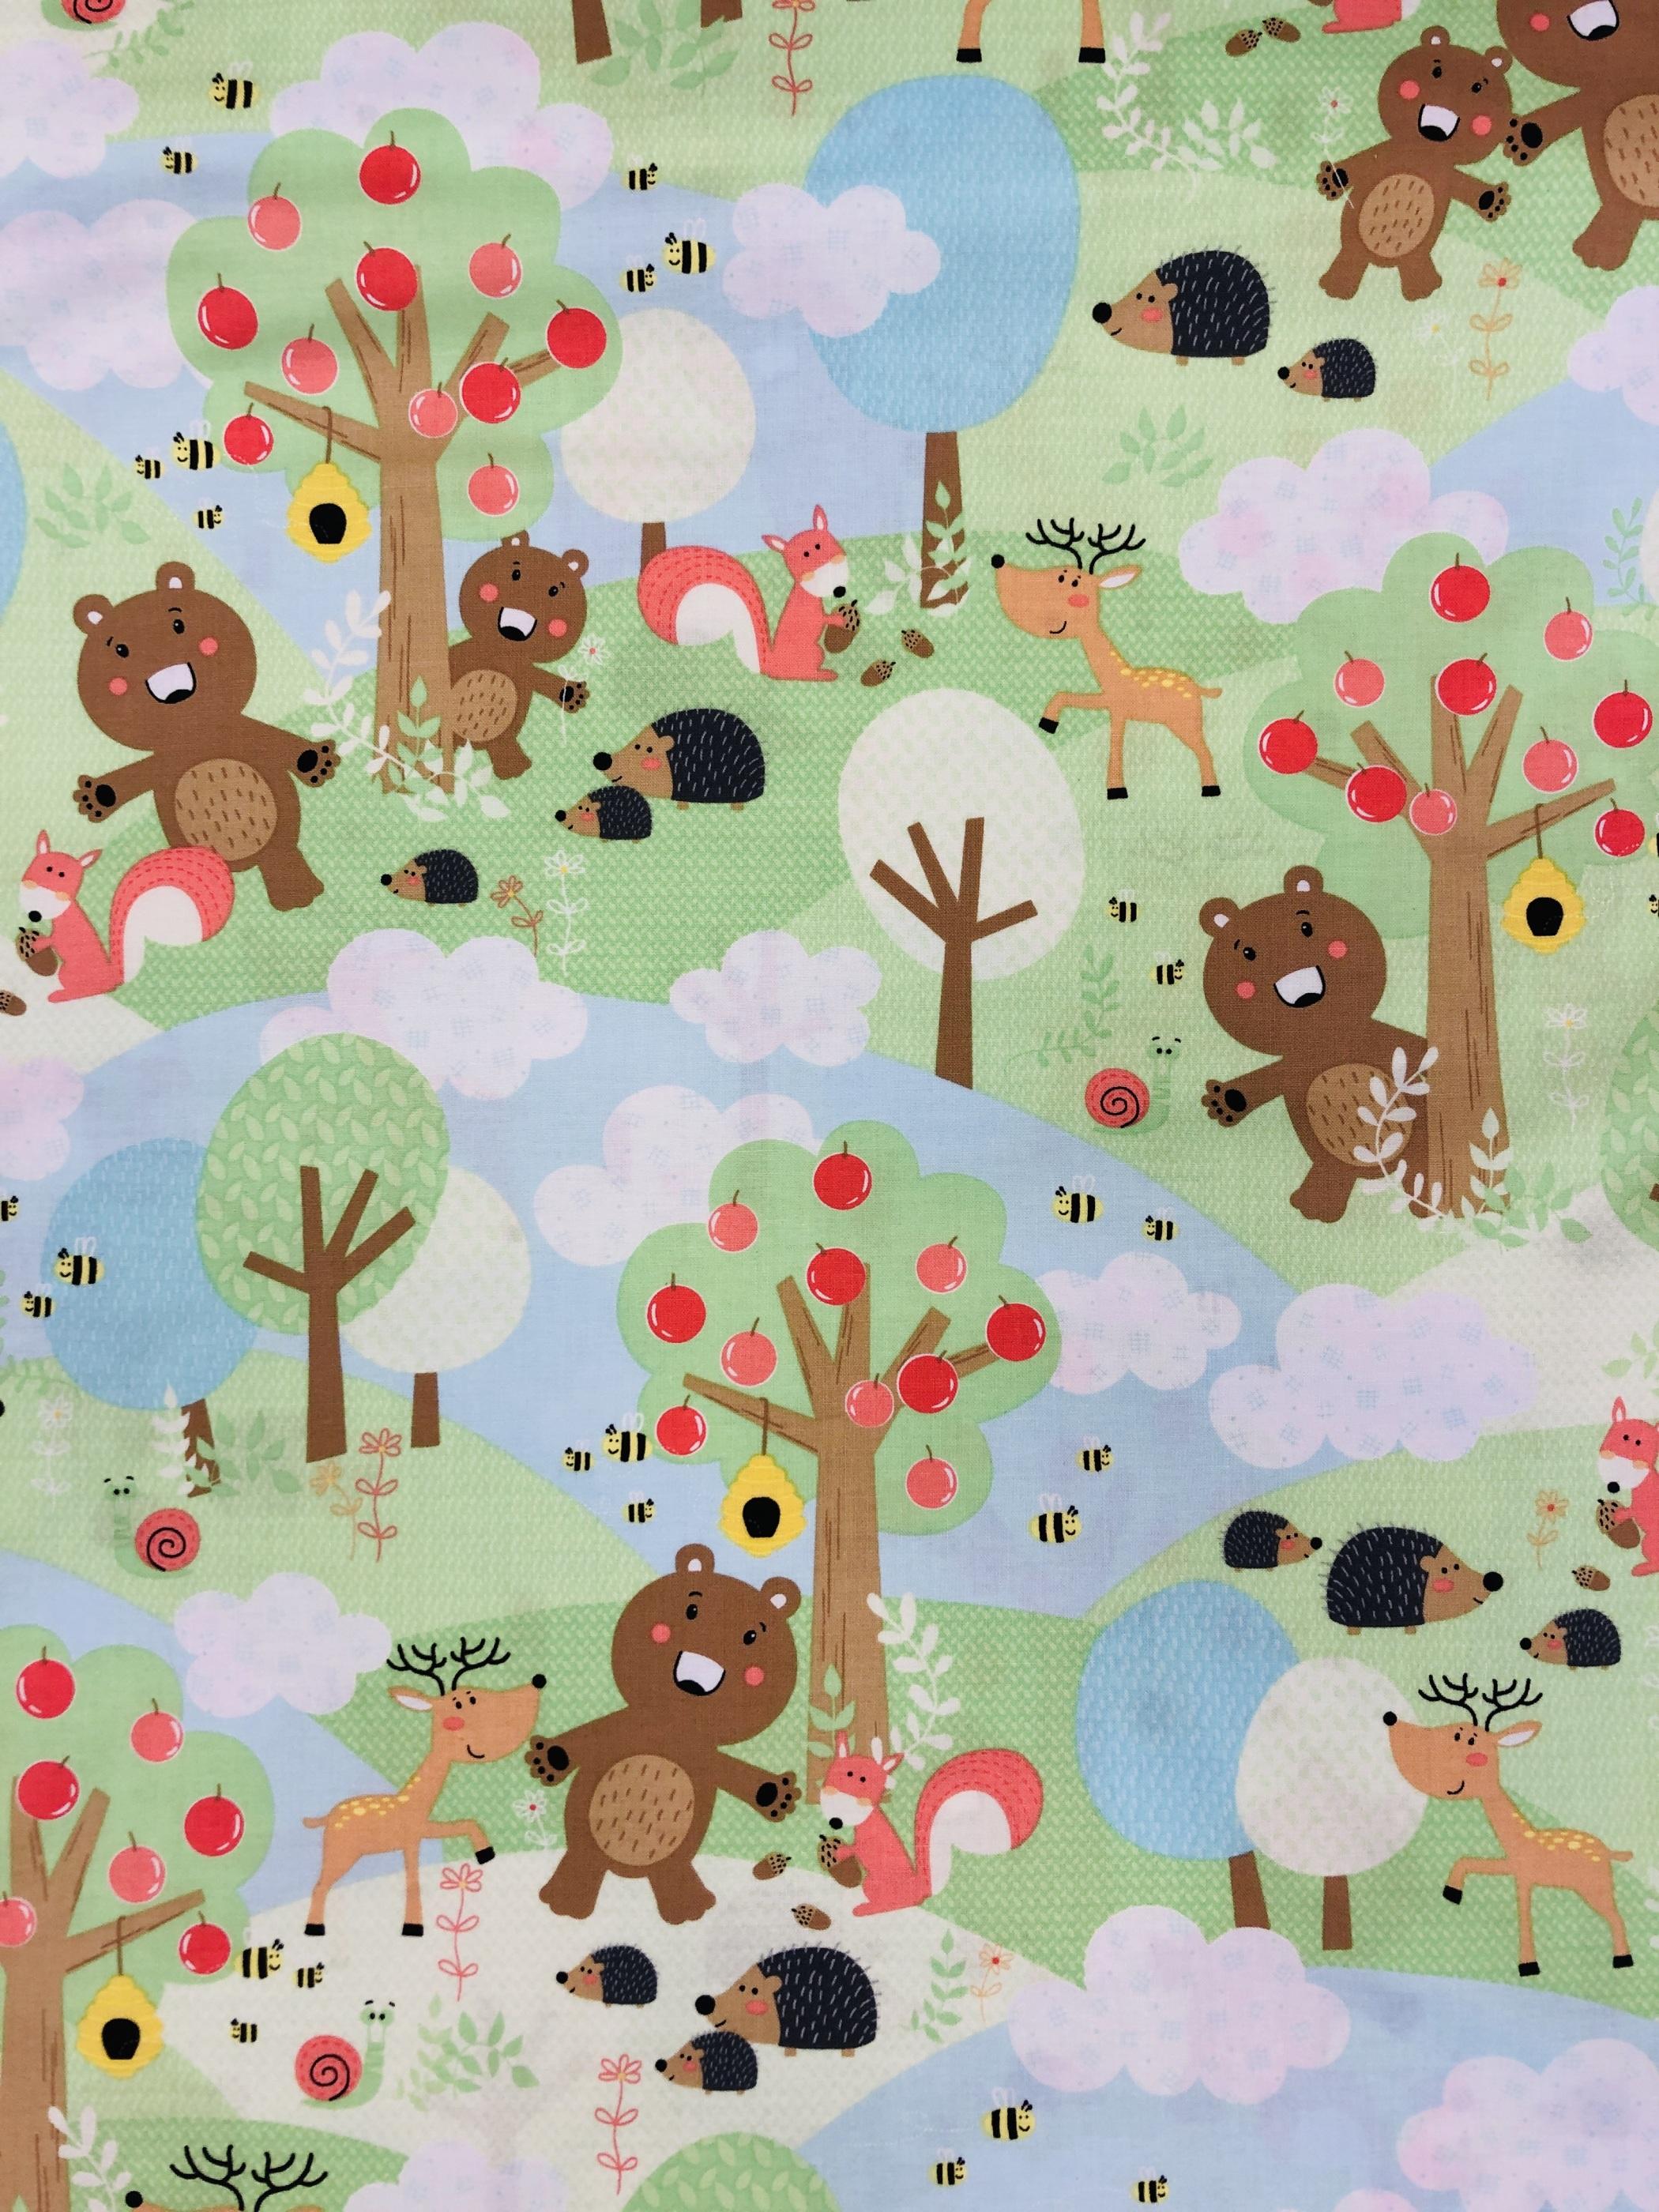 Friendship Forest barntyg djur igelkott Björn nalle träd blå grön metervara ekorre Tyglust Laholm